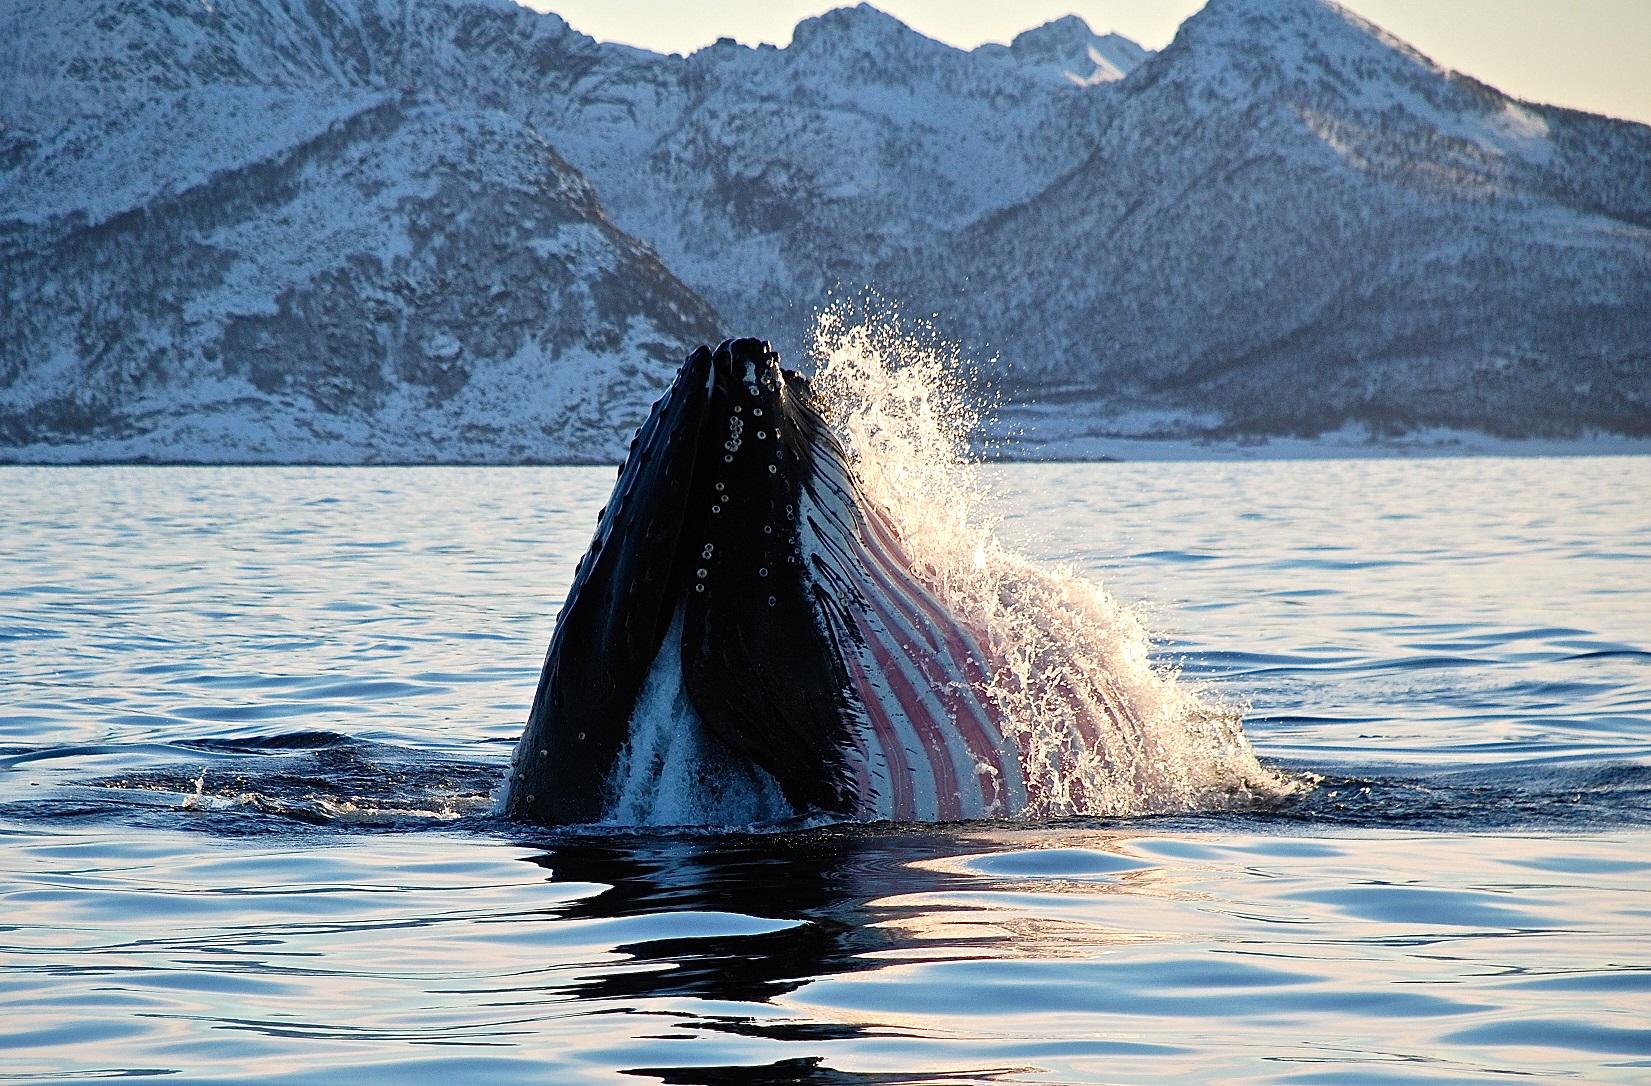 Humpback whale off the coast of Senja Hamn i Senja 2